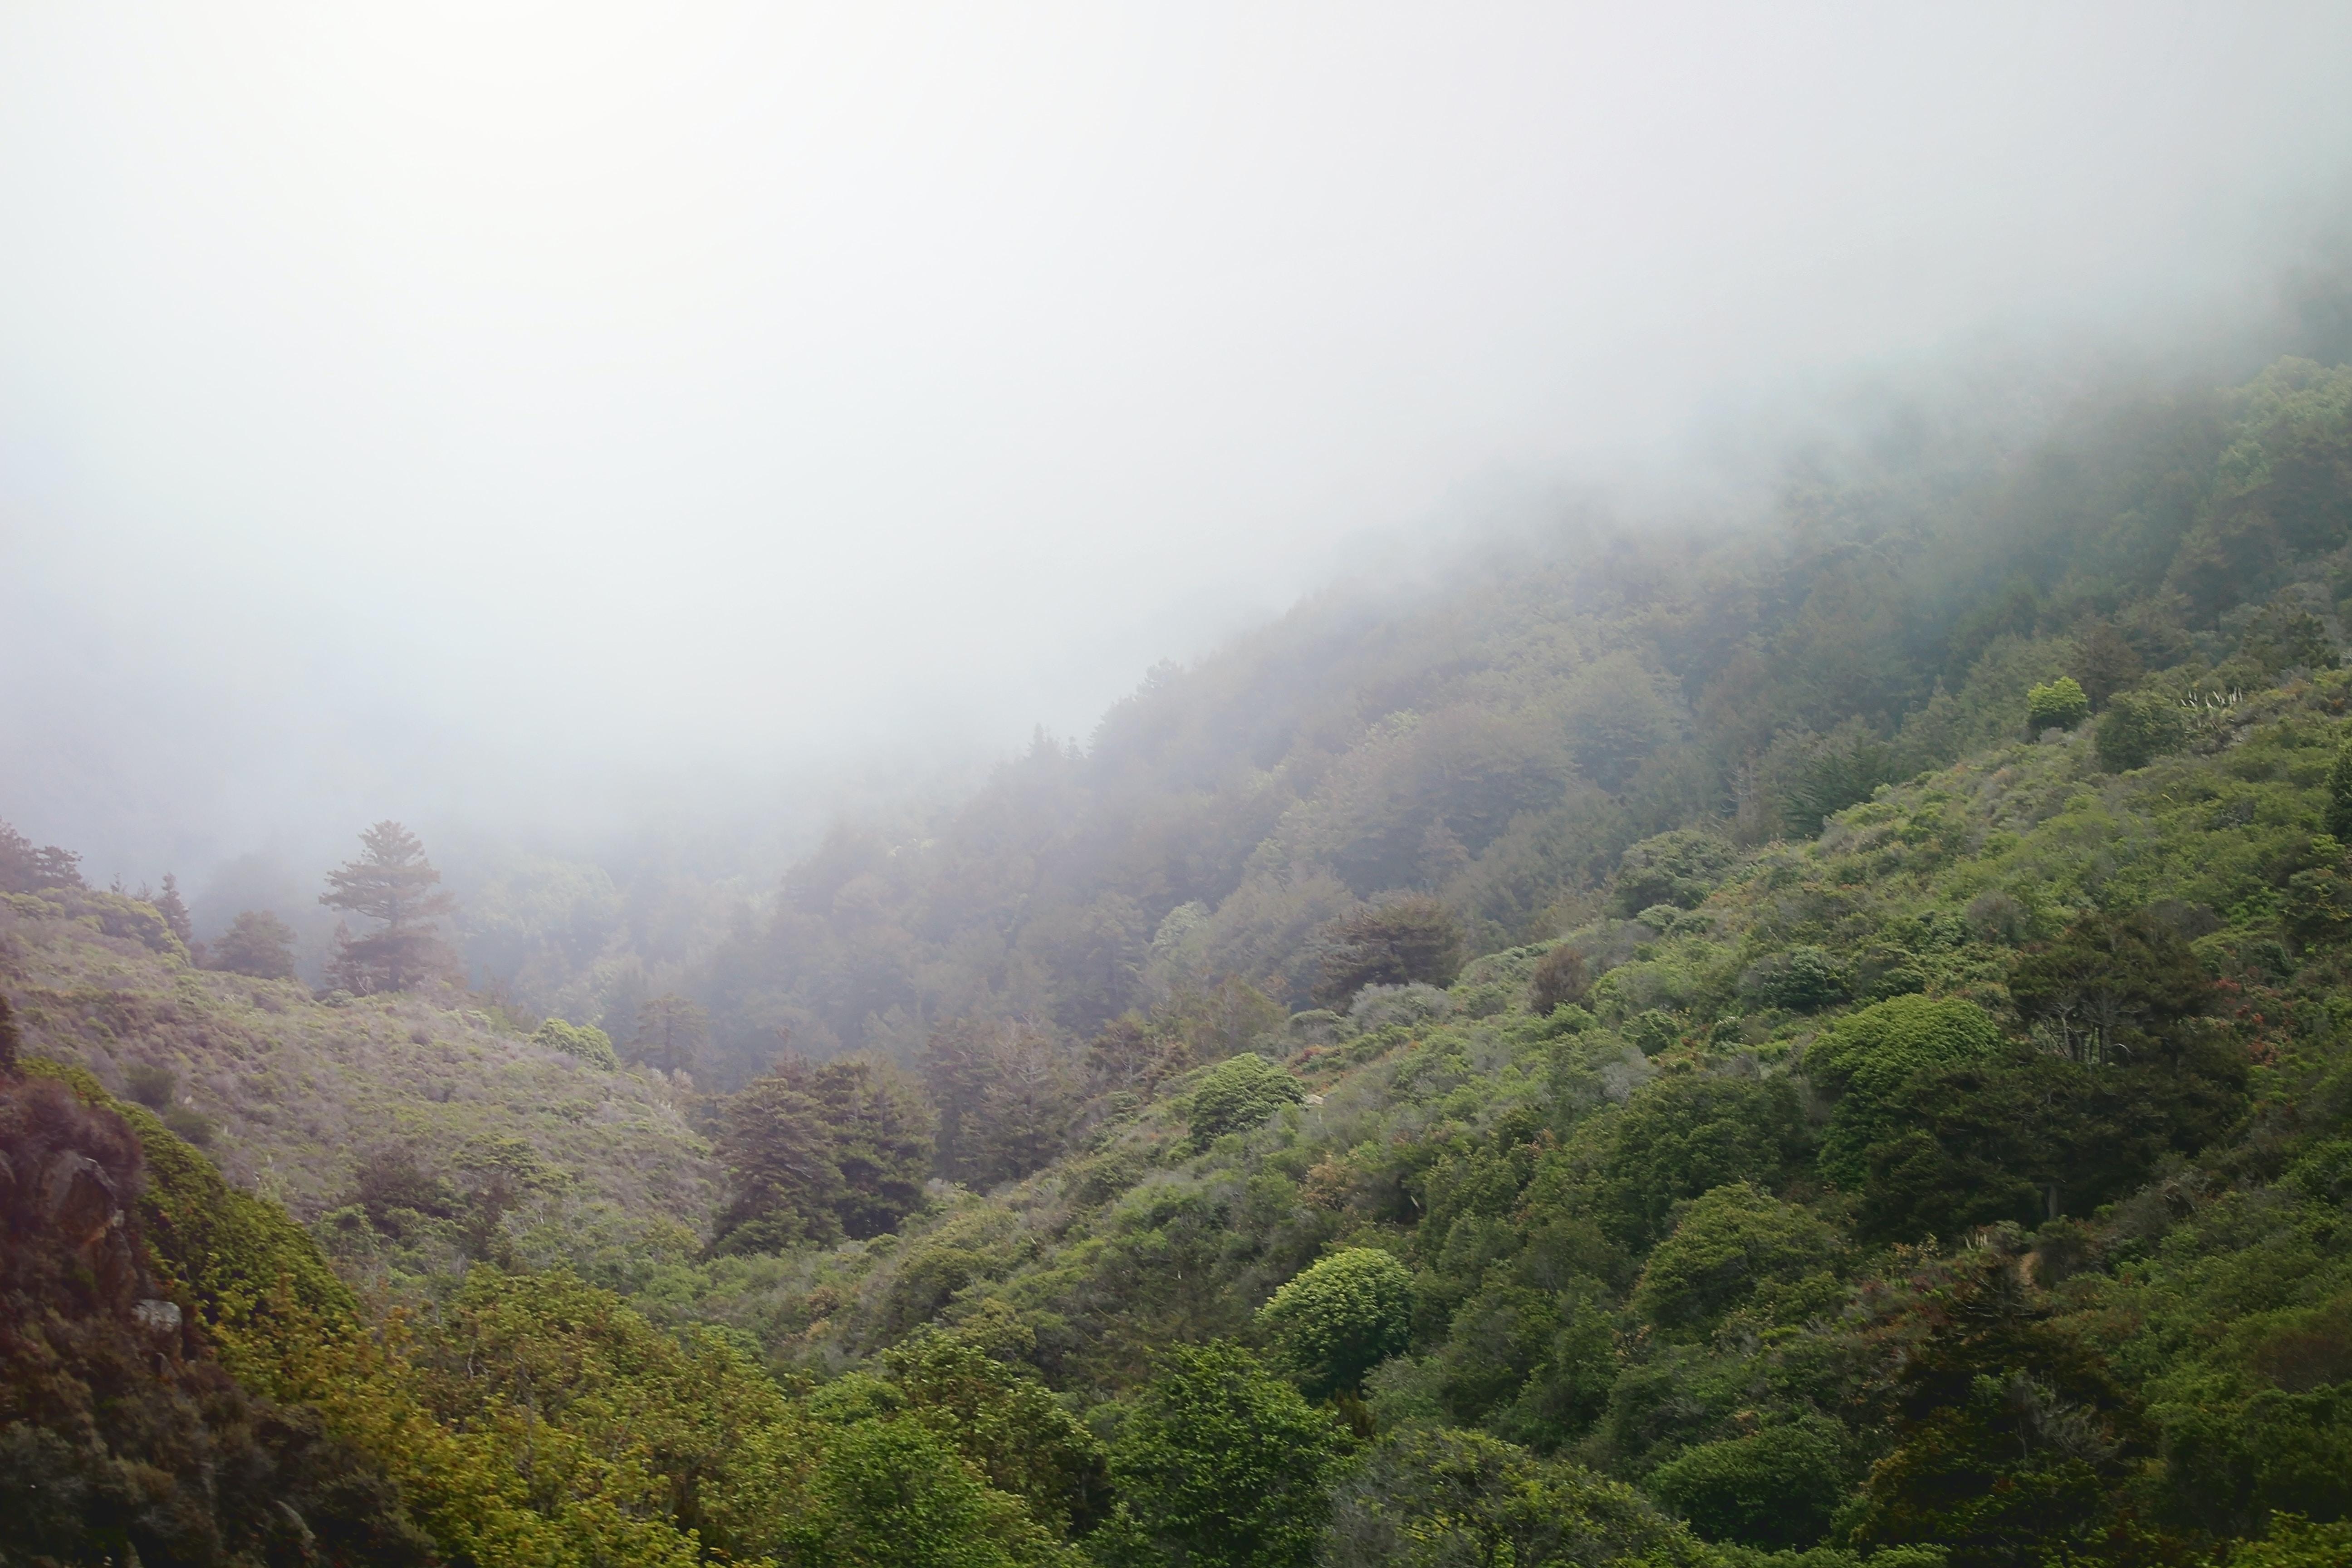 Pale mist over wooded hills in Big Sur